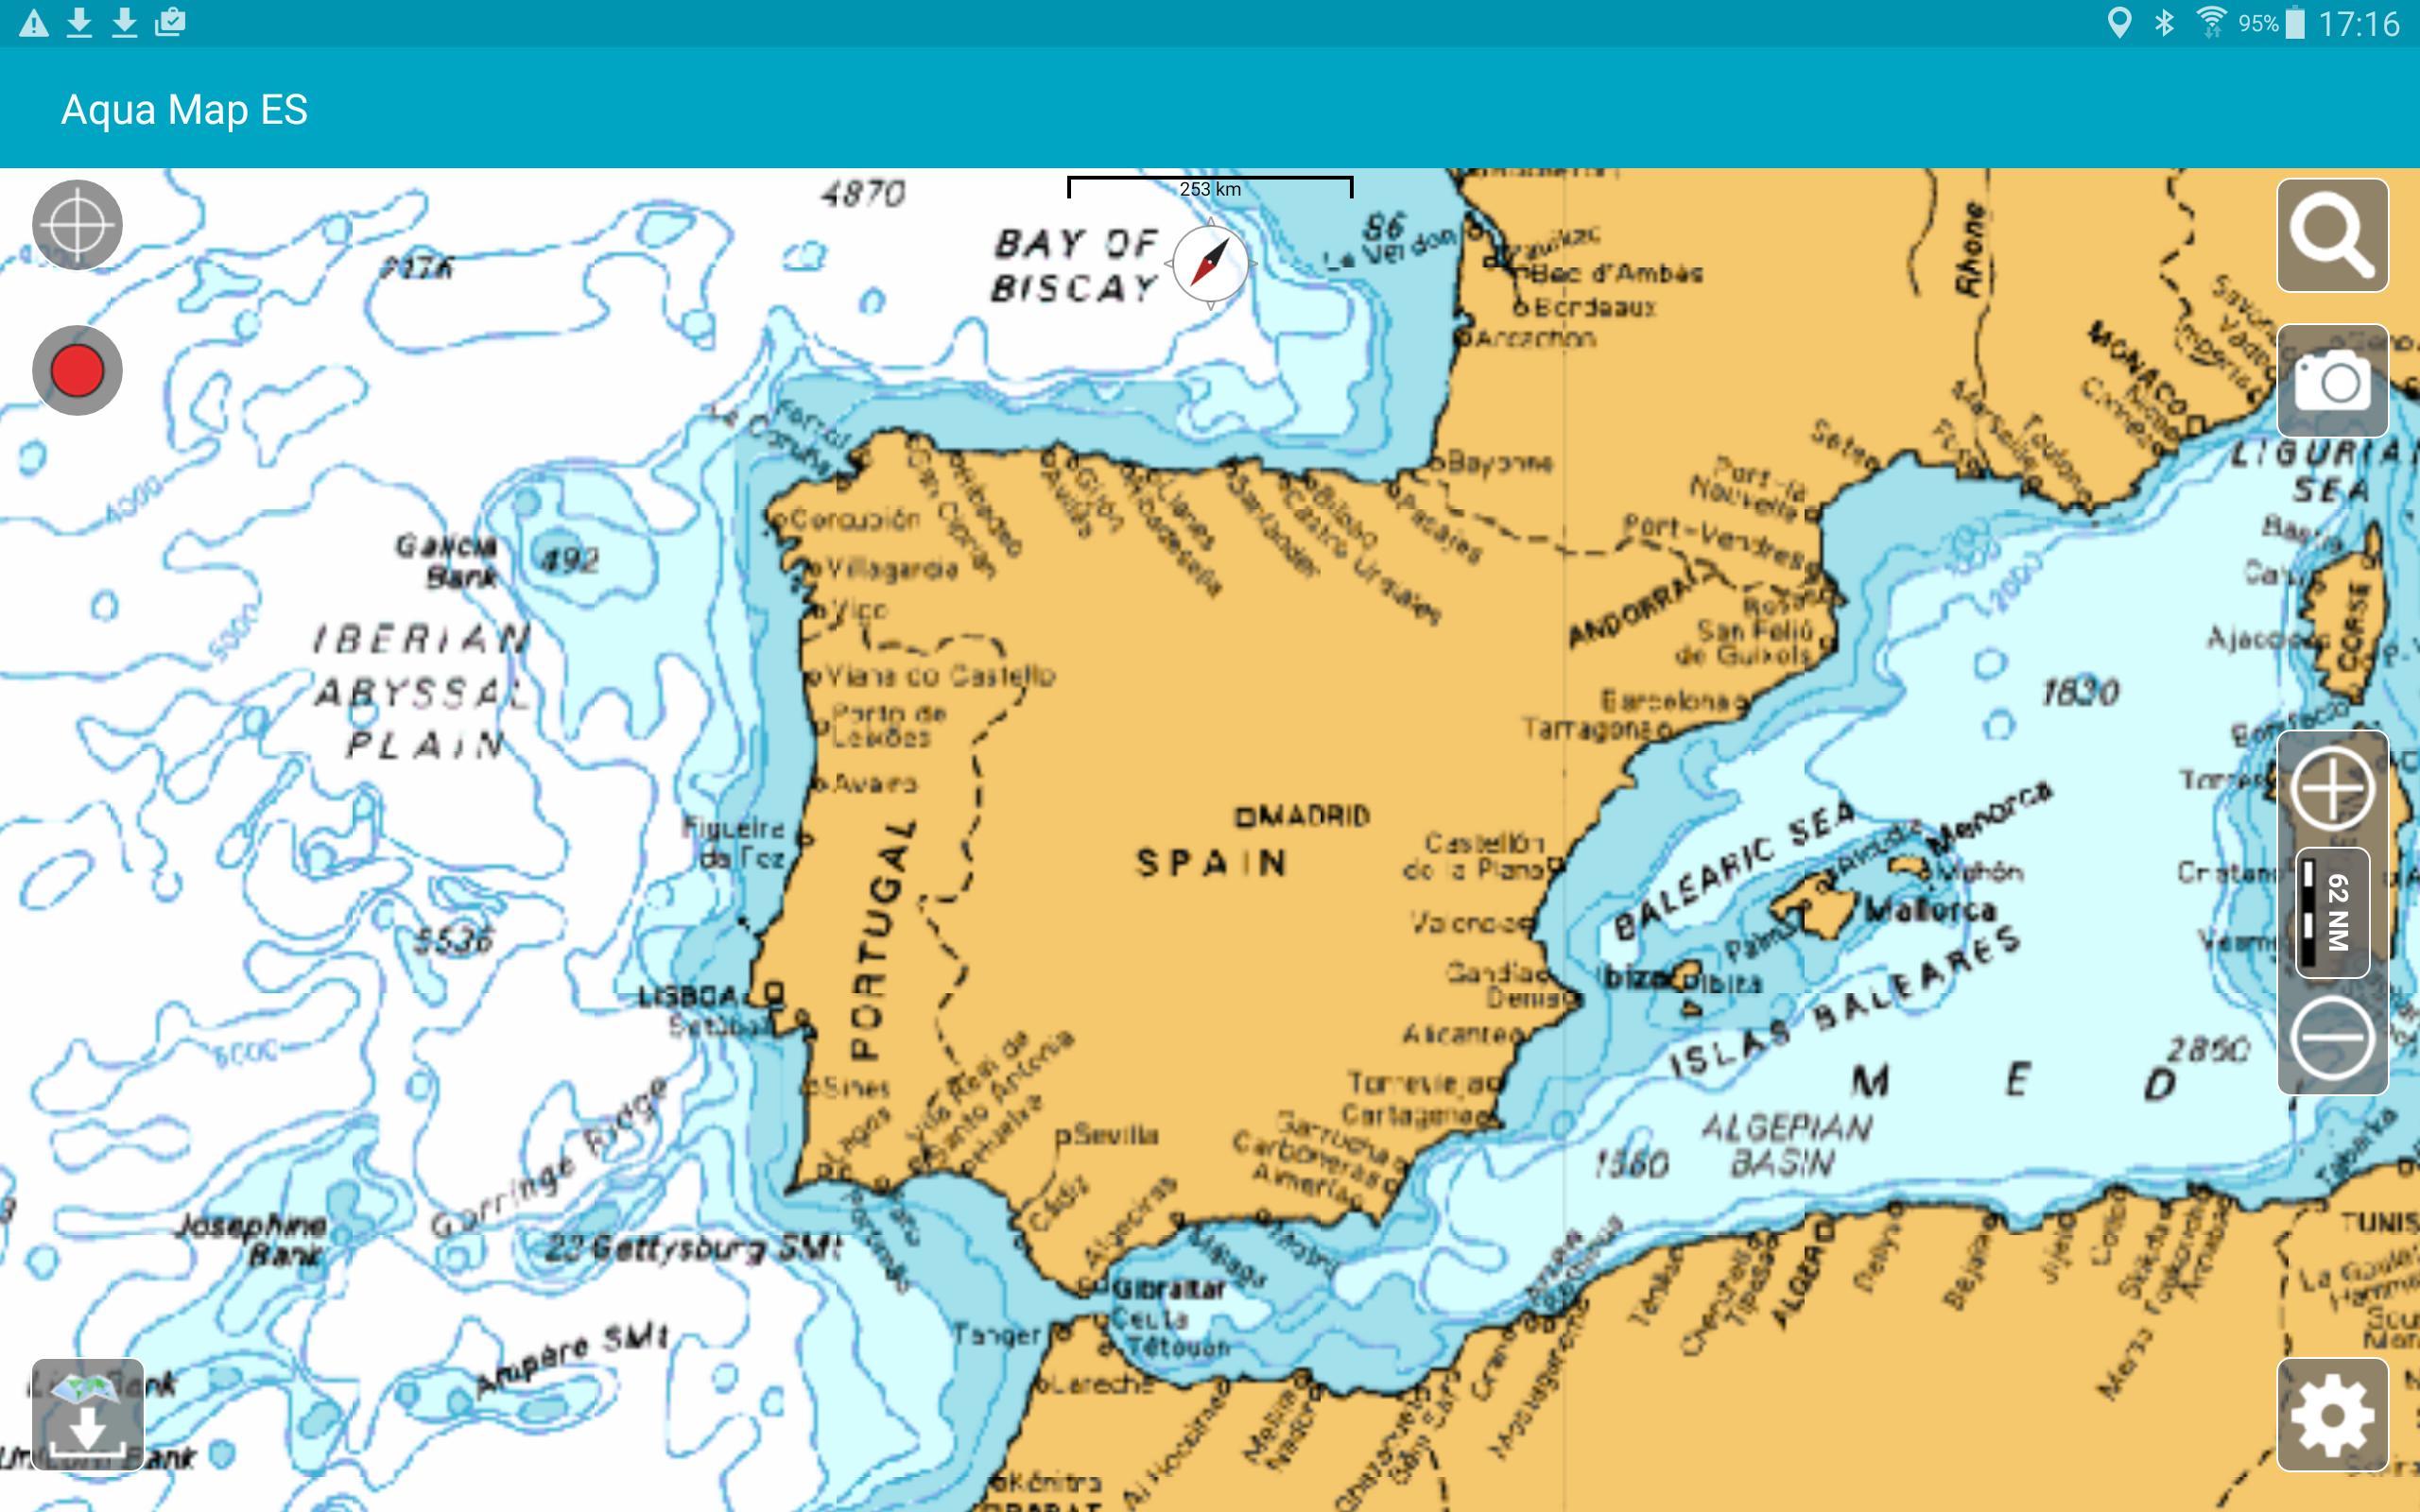 Aqua Map Iberia - Marine GPS for Android - APK Download Iberia Map on